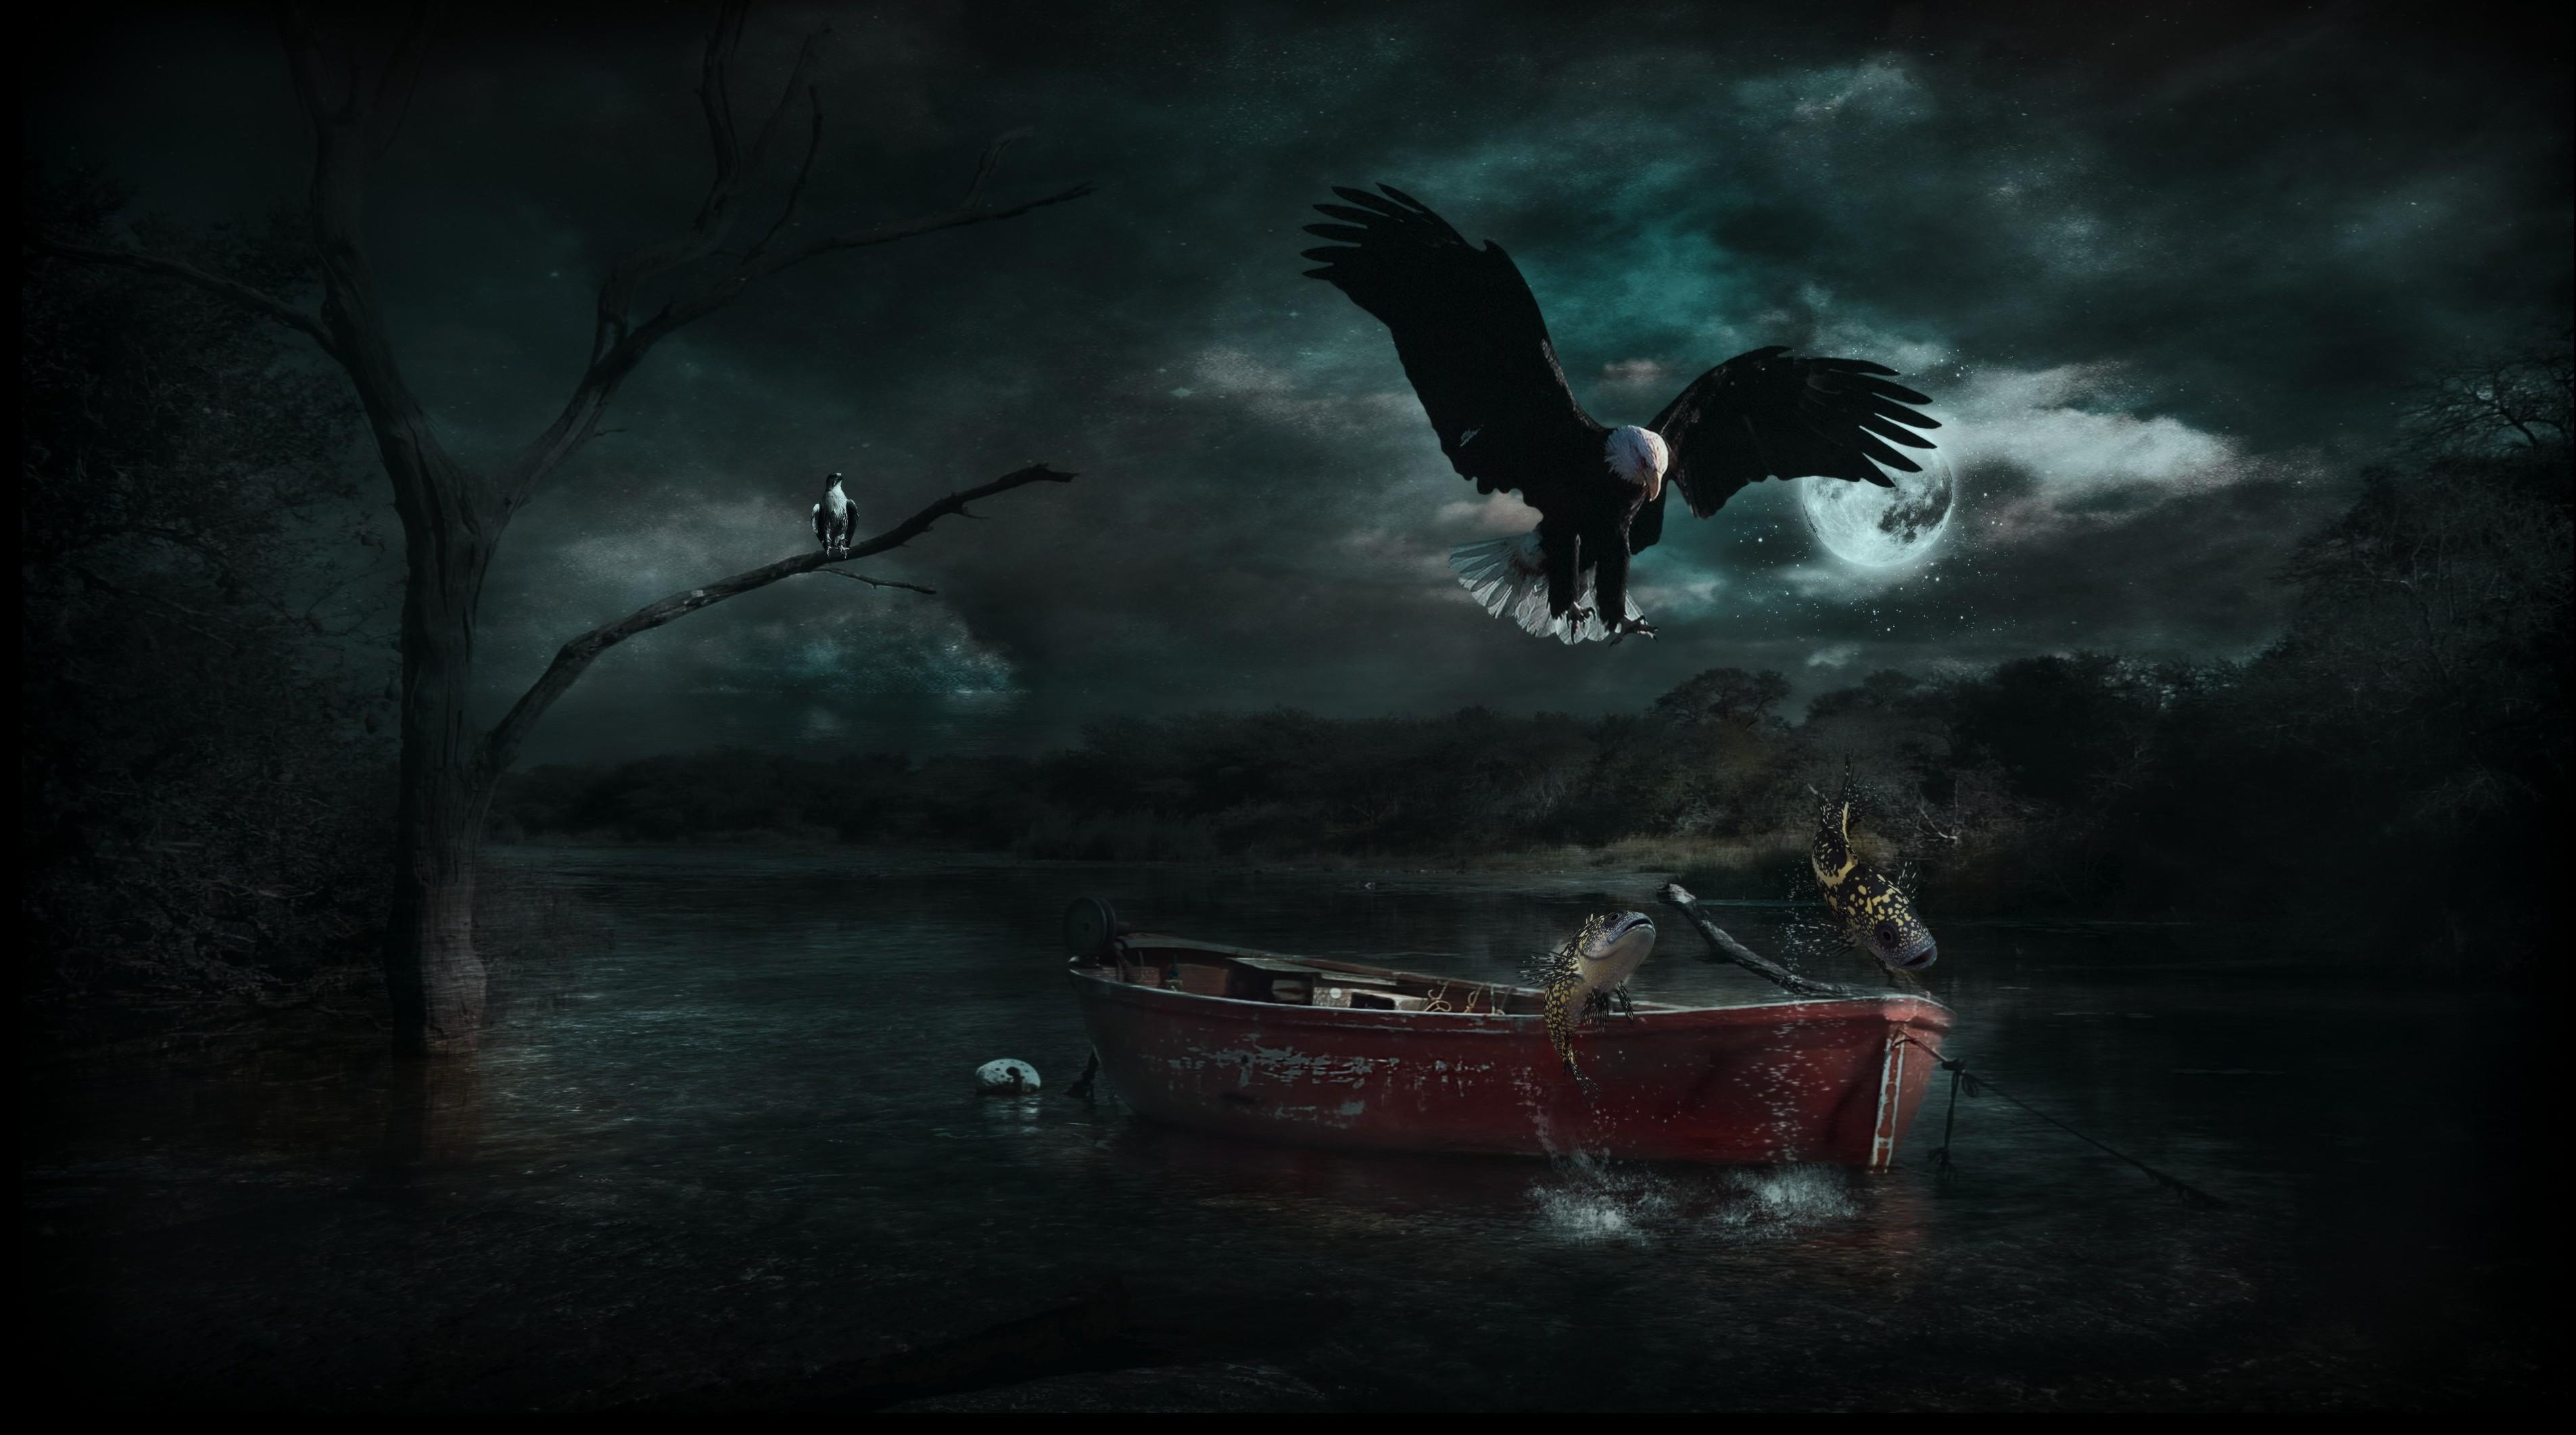 Wallpaper Landscape Boat Nature Photo Manipulation Moonlight